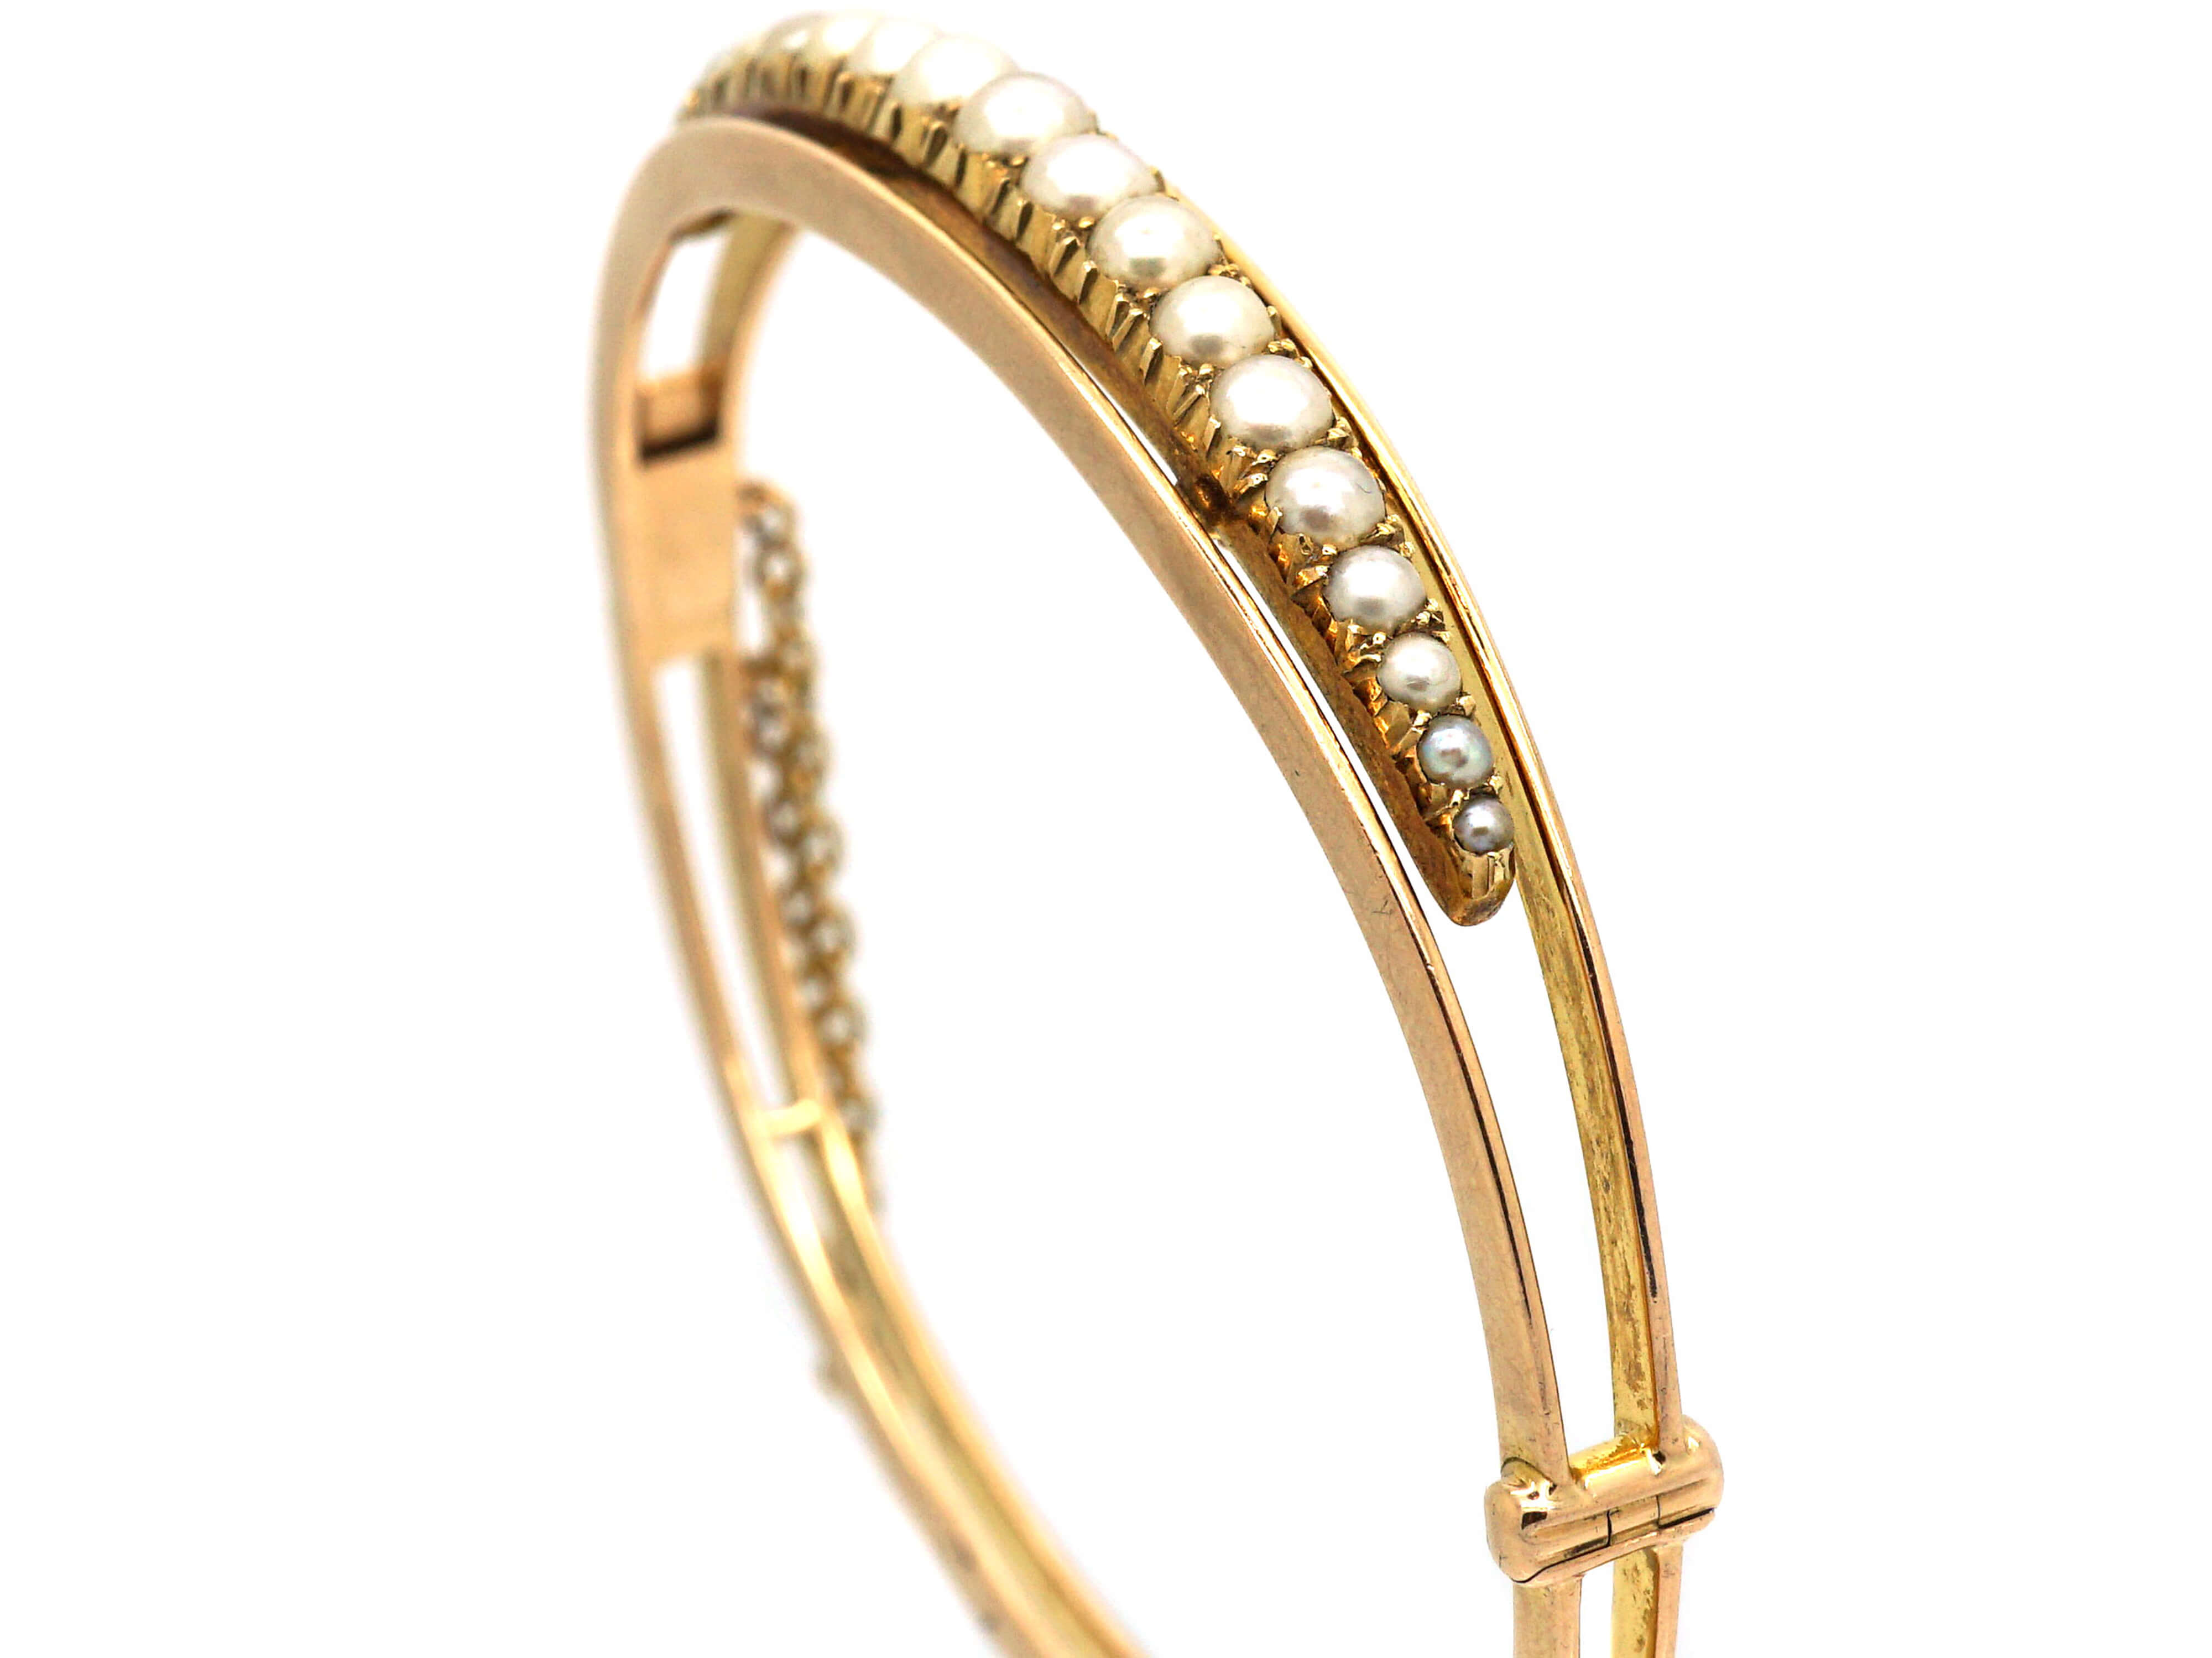 Edwardian 15ct Gold & Natural Split Pearls Bangle